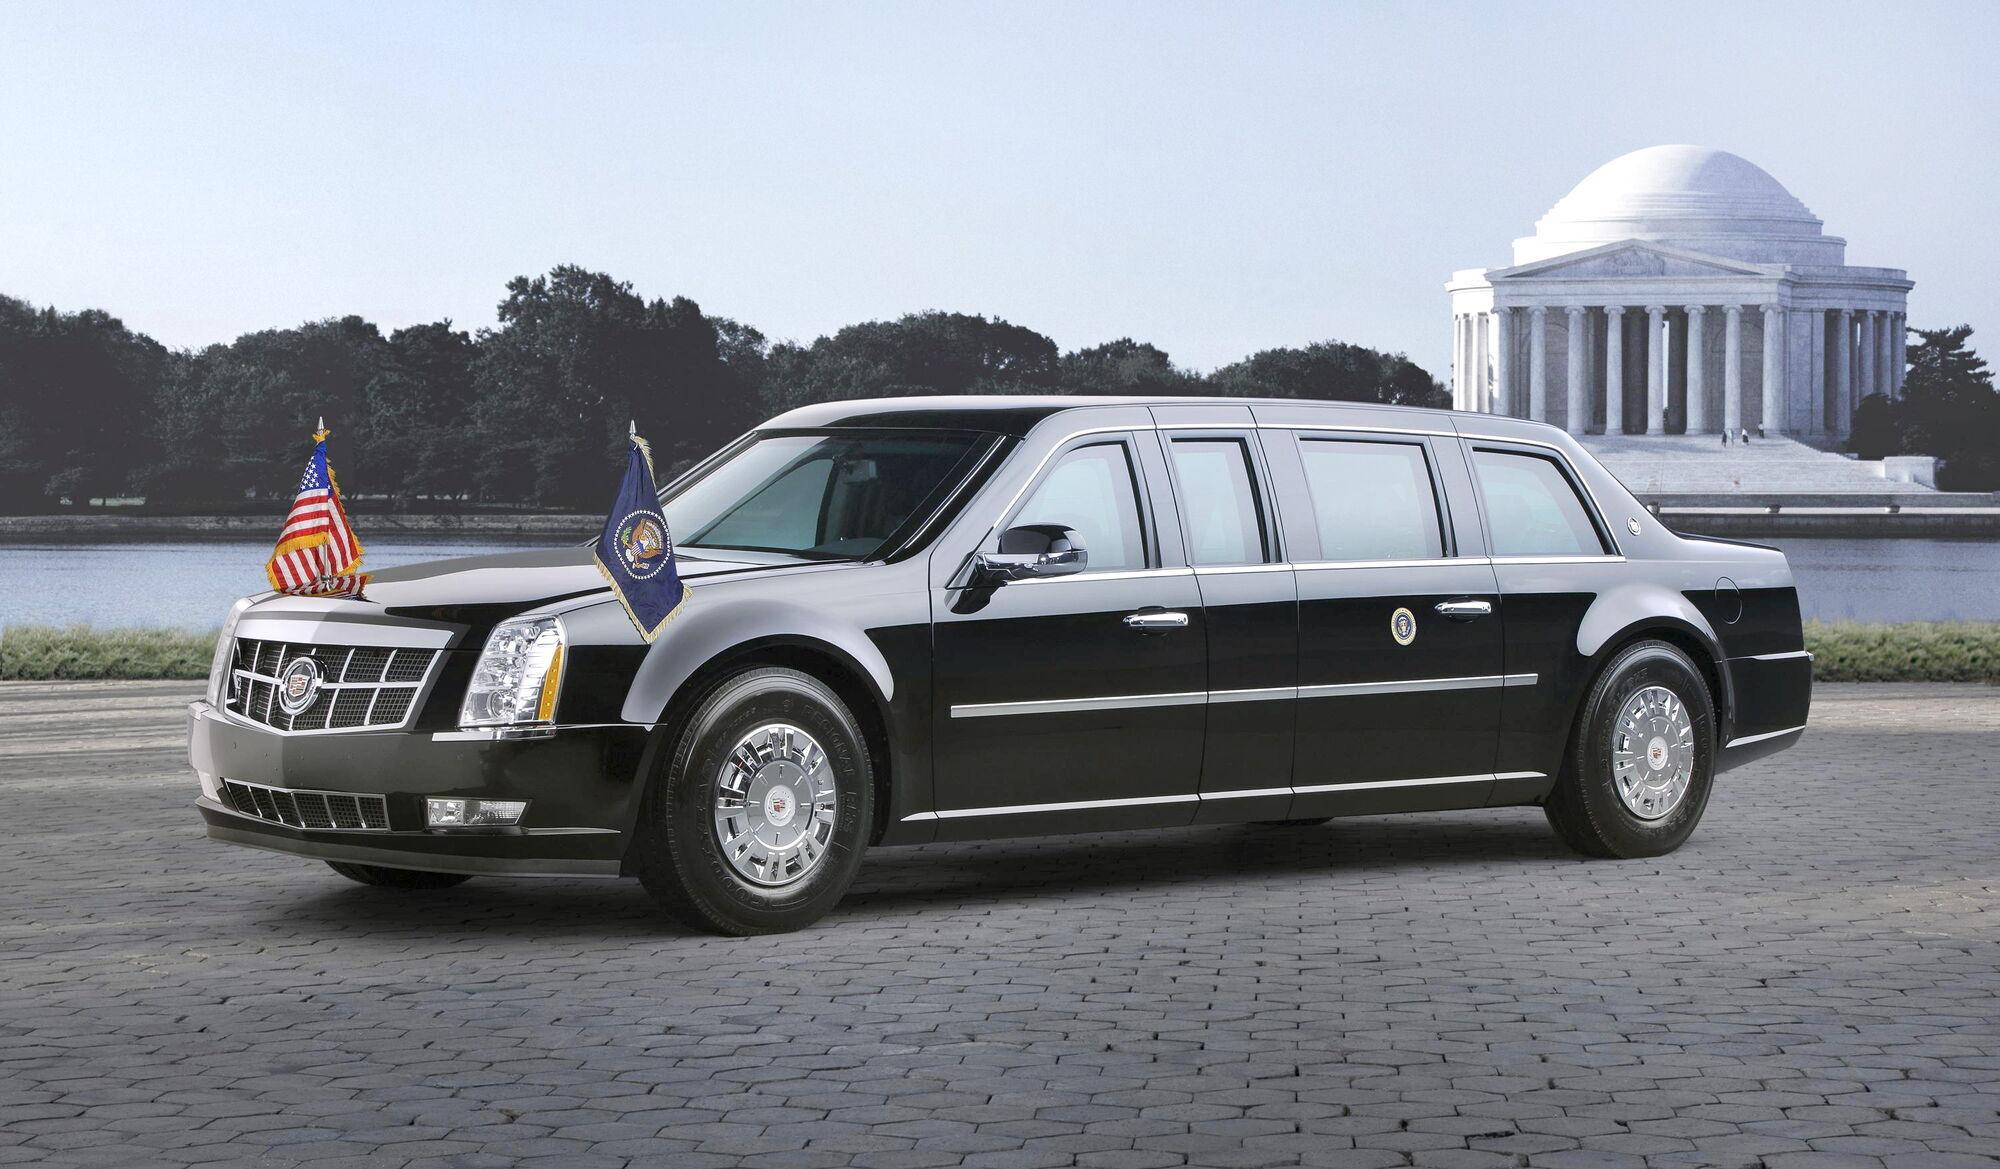 Cadillac 2009 року Президент США Барака Обами